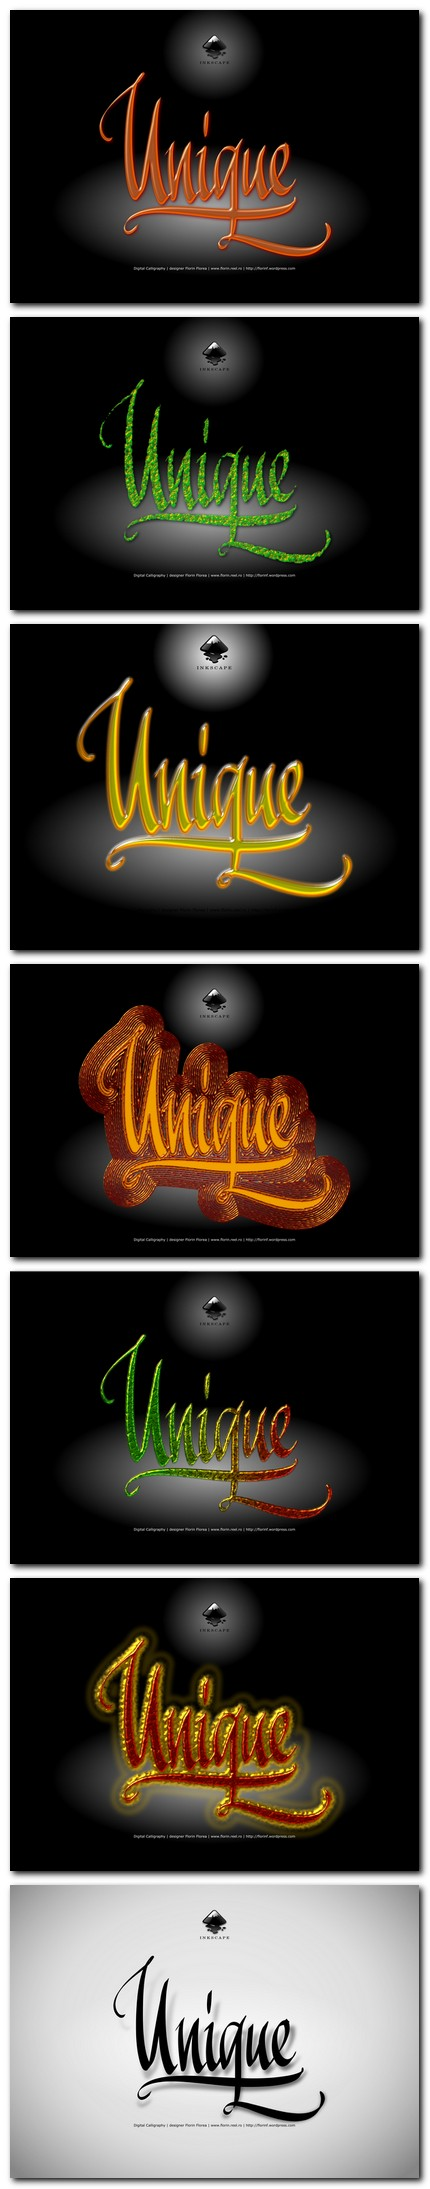 Unic, unicat sau unique - caligrafie de Florin Florea (serie)